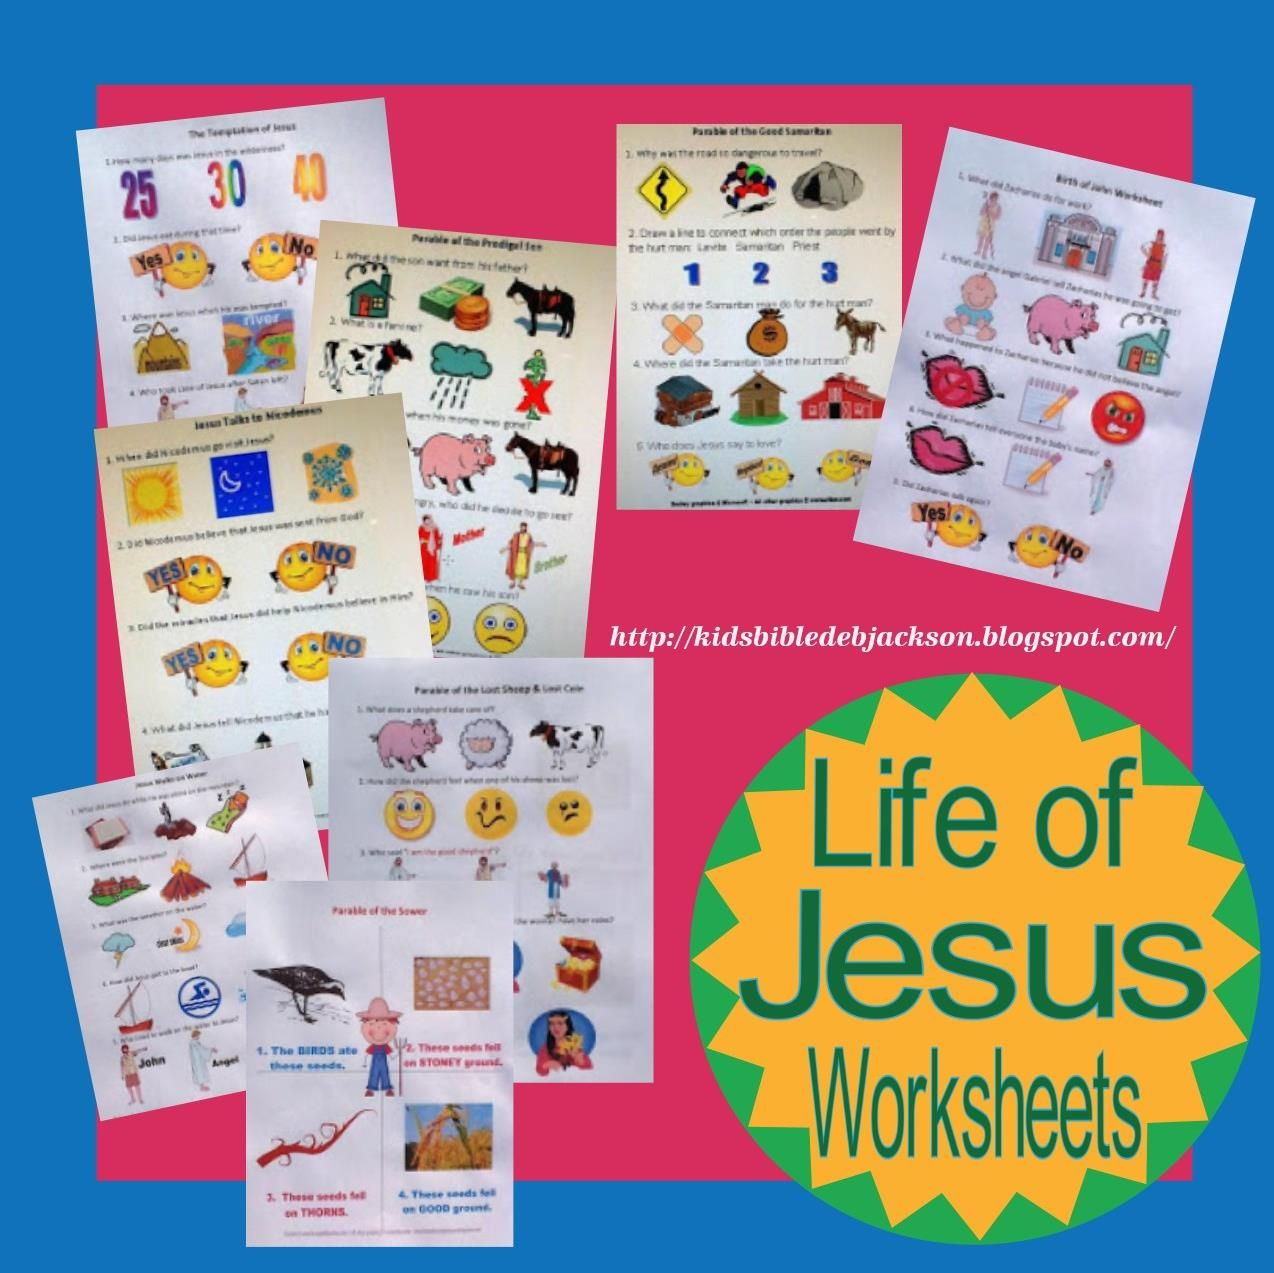 worksheet Jesus Worksheets For Kids bible fun for kids life of jesus worksheets gospels pinterest worksheets